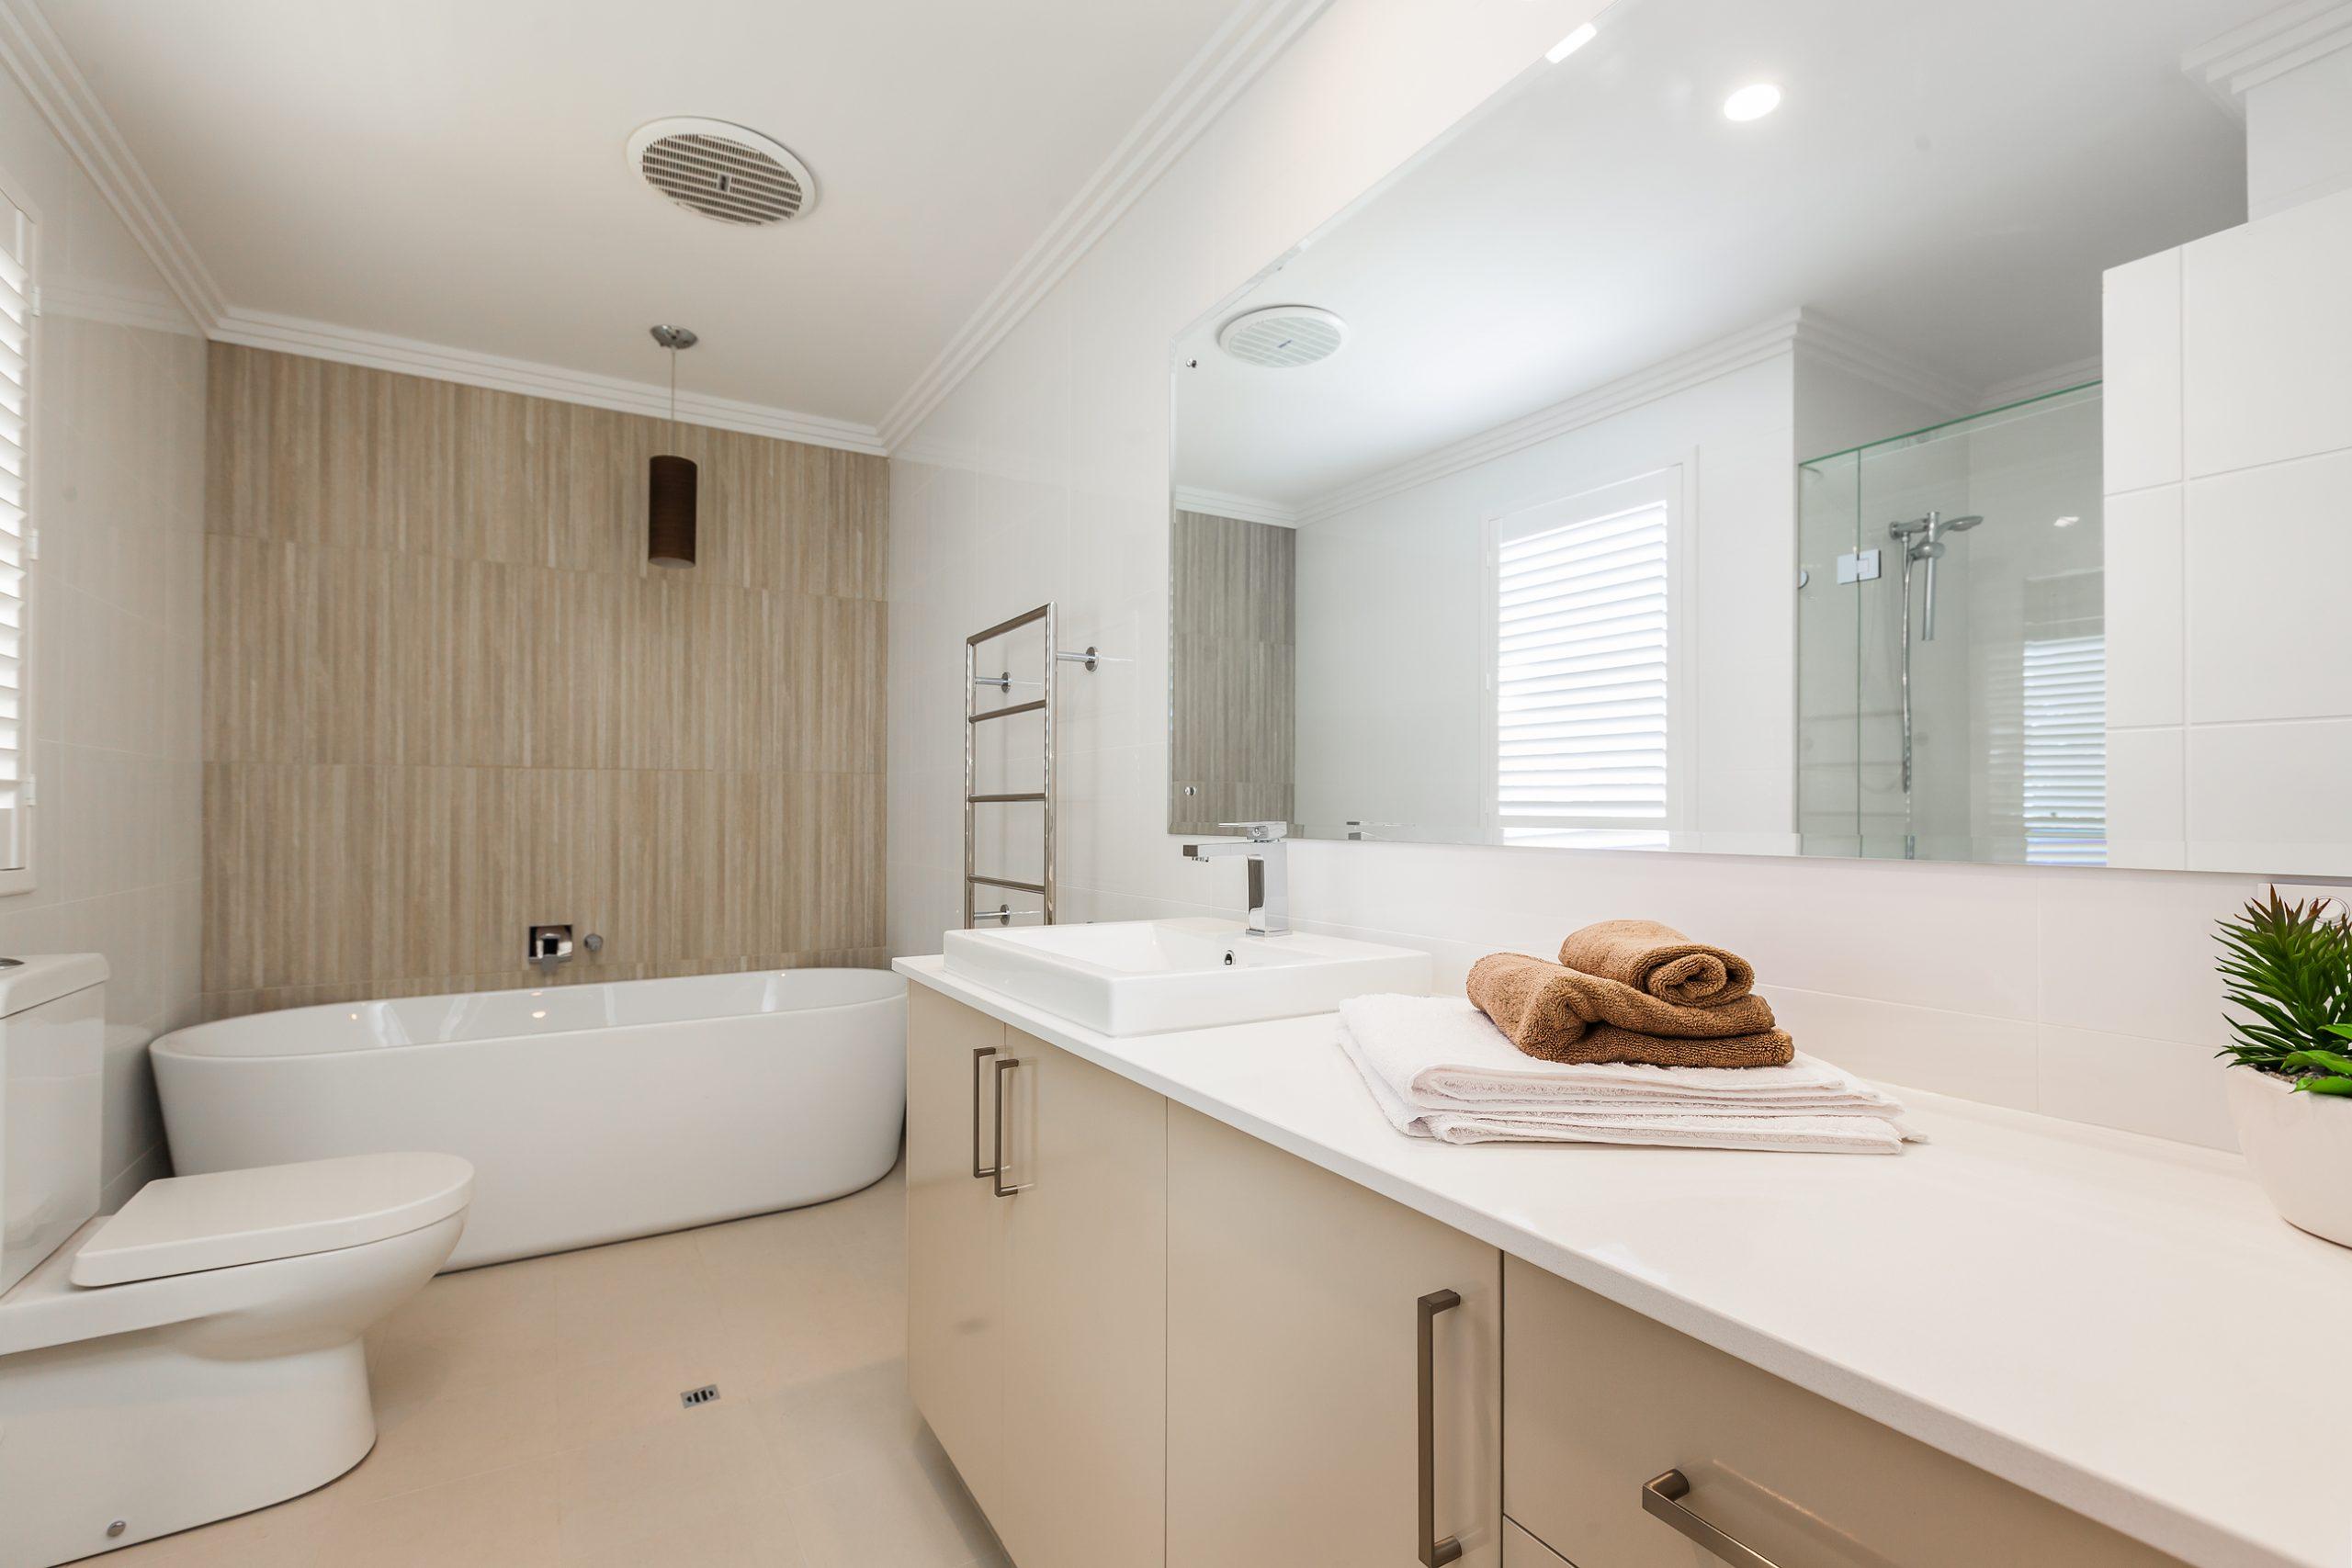 Bathrrom with a large mirror, bathtub, sink and a toilet